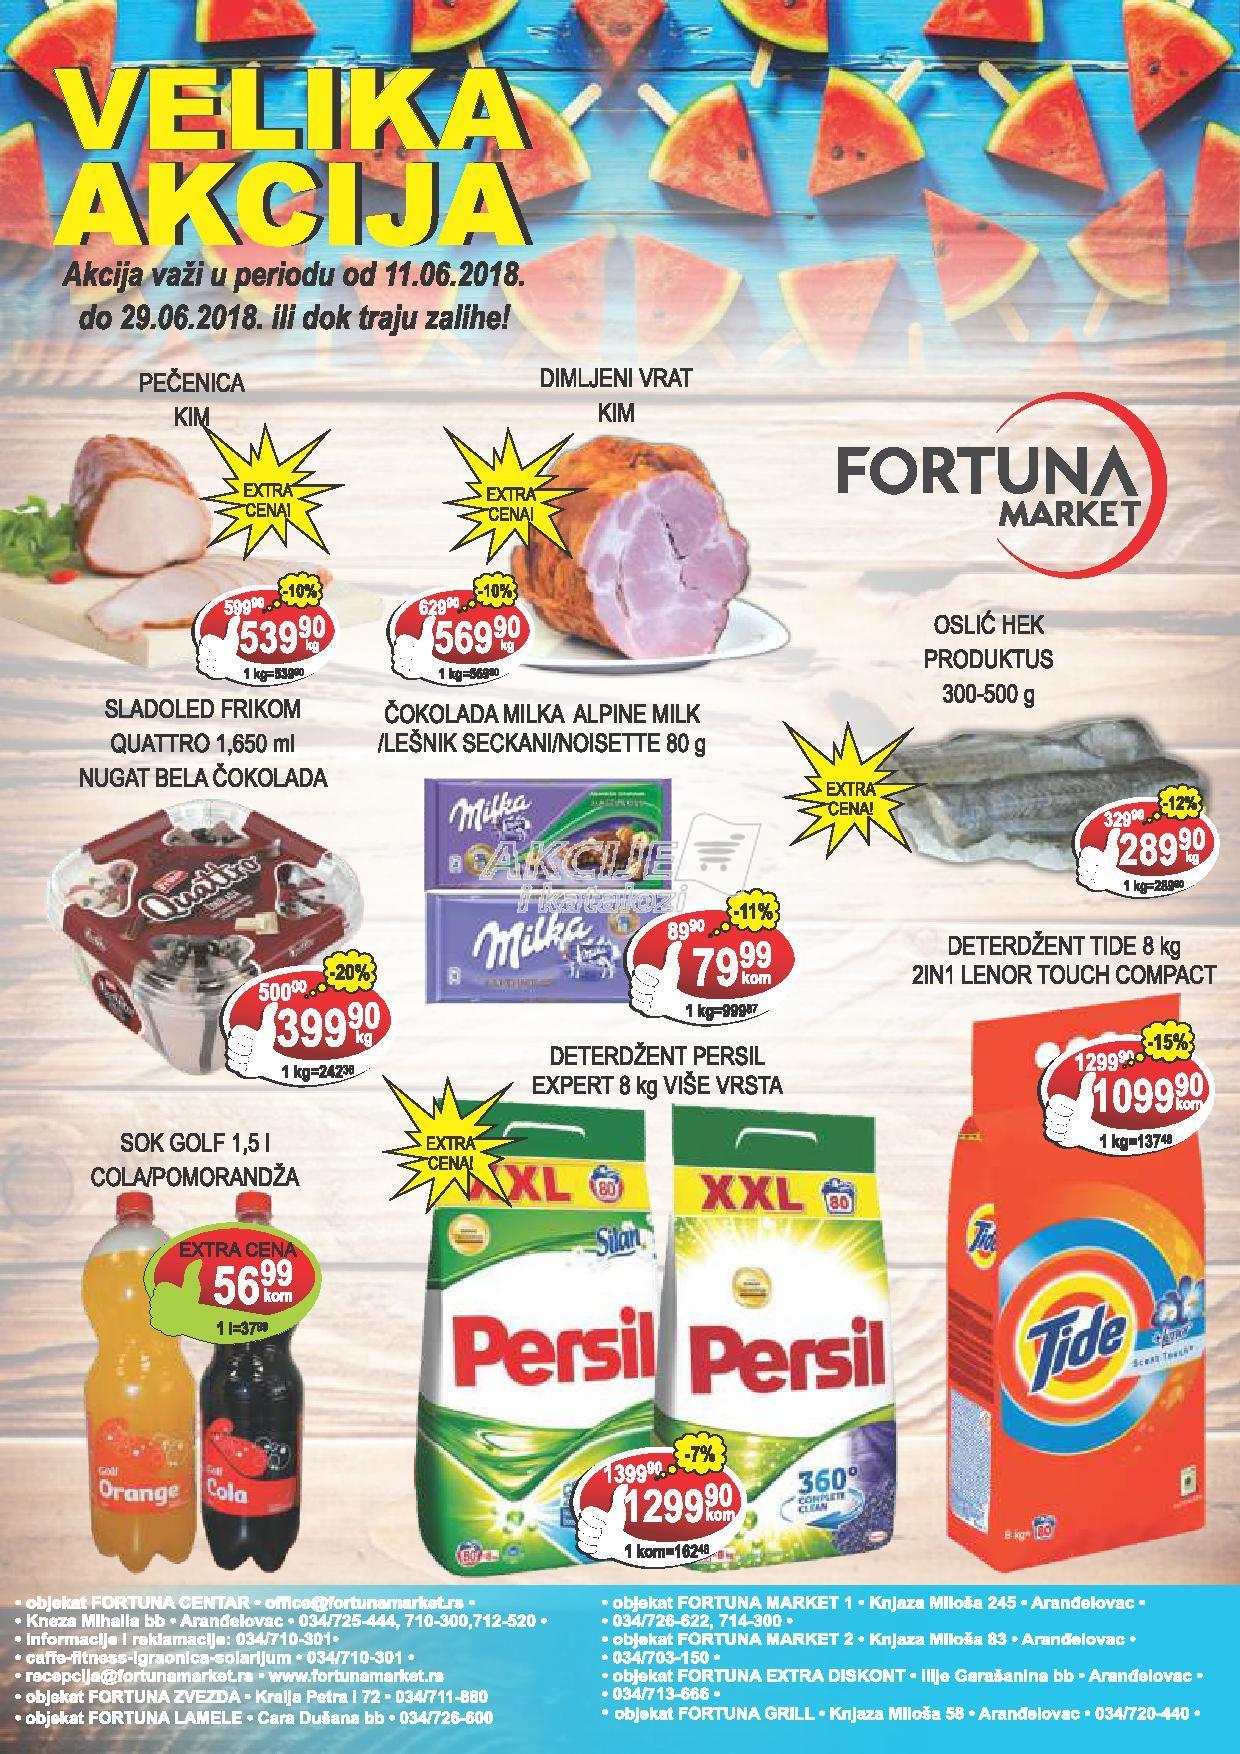 Fotruna market akcija super cena